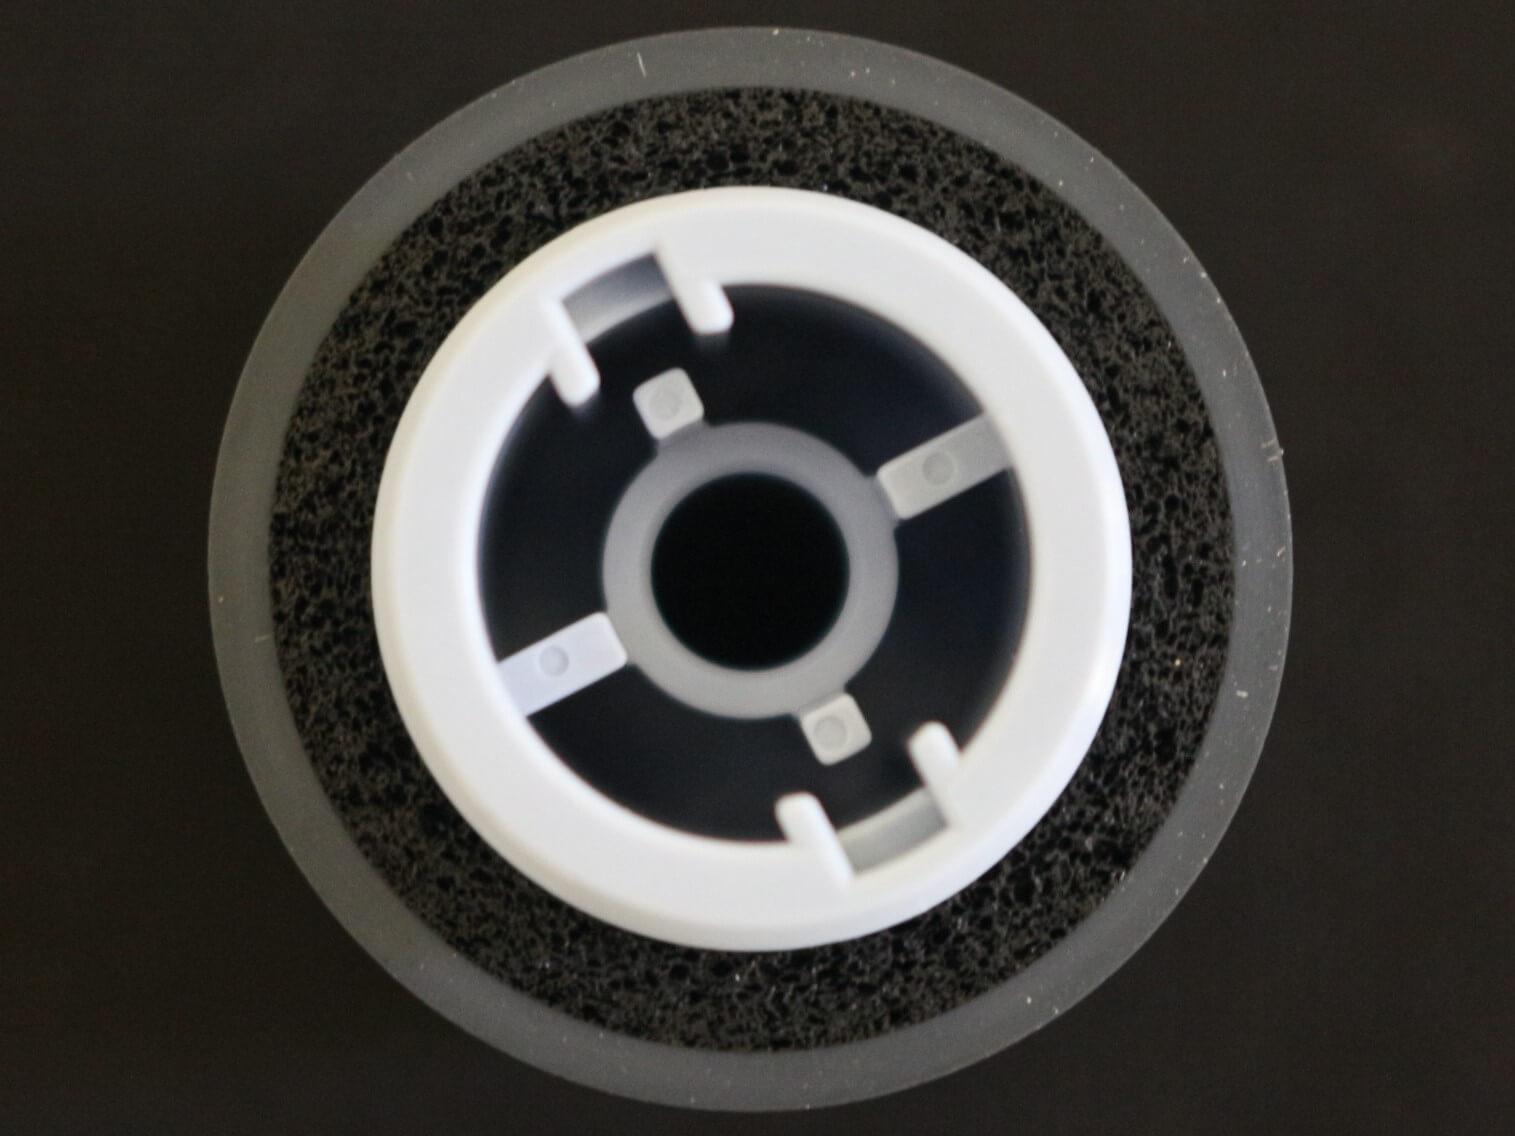 Foto close por cima Brake Roller PA03740-K010 para Scanners Fujitsu fi-7600 fi-7700 e fi-7700S